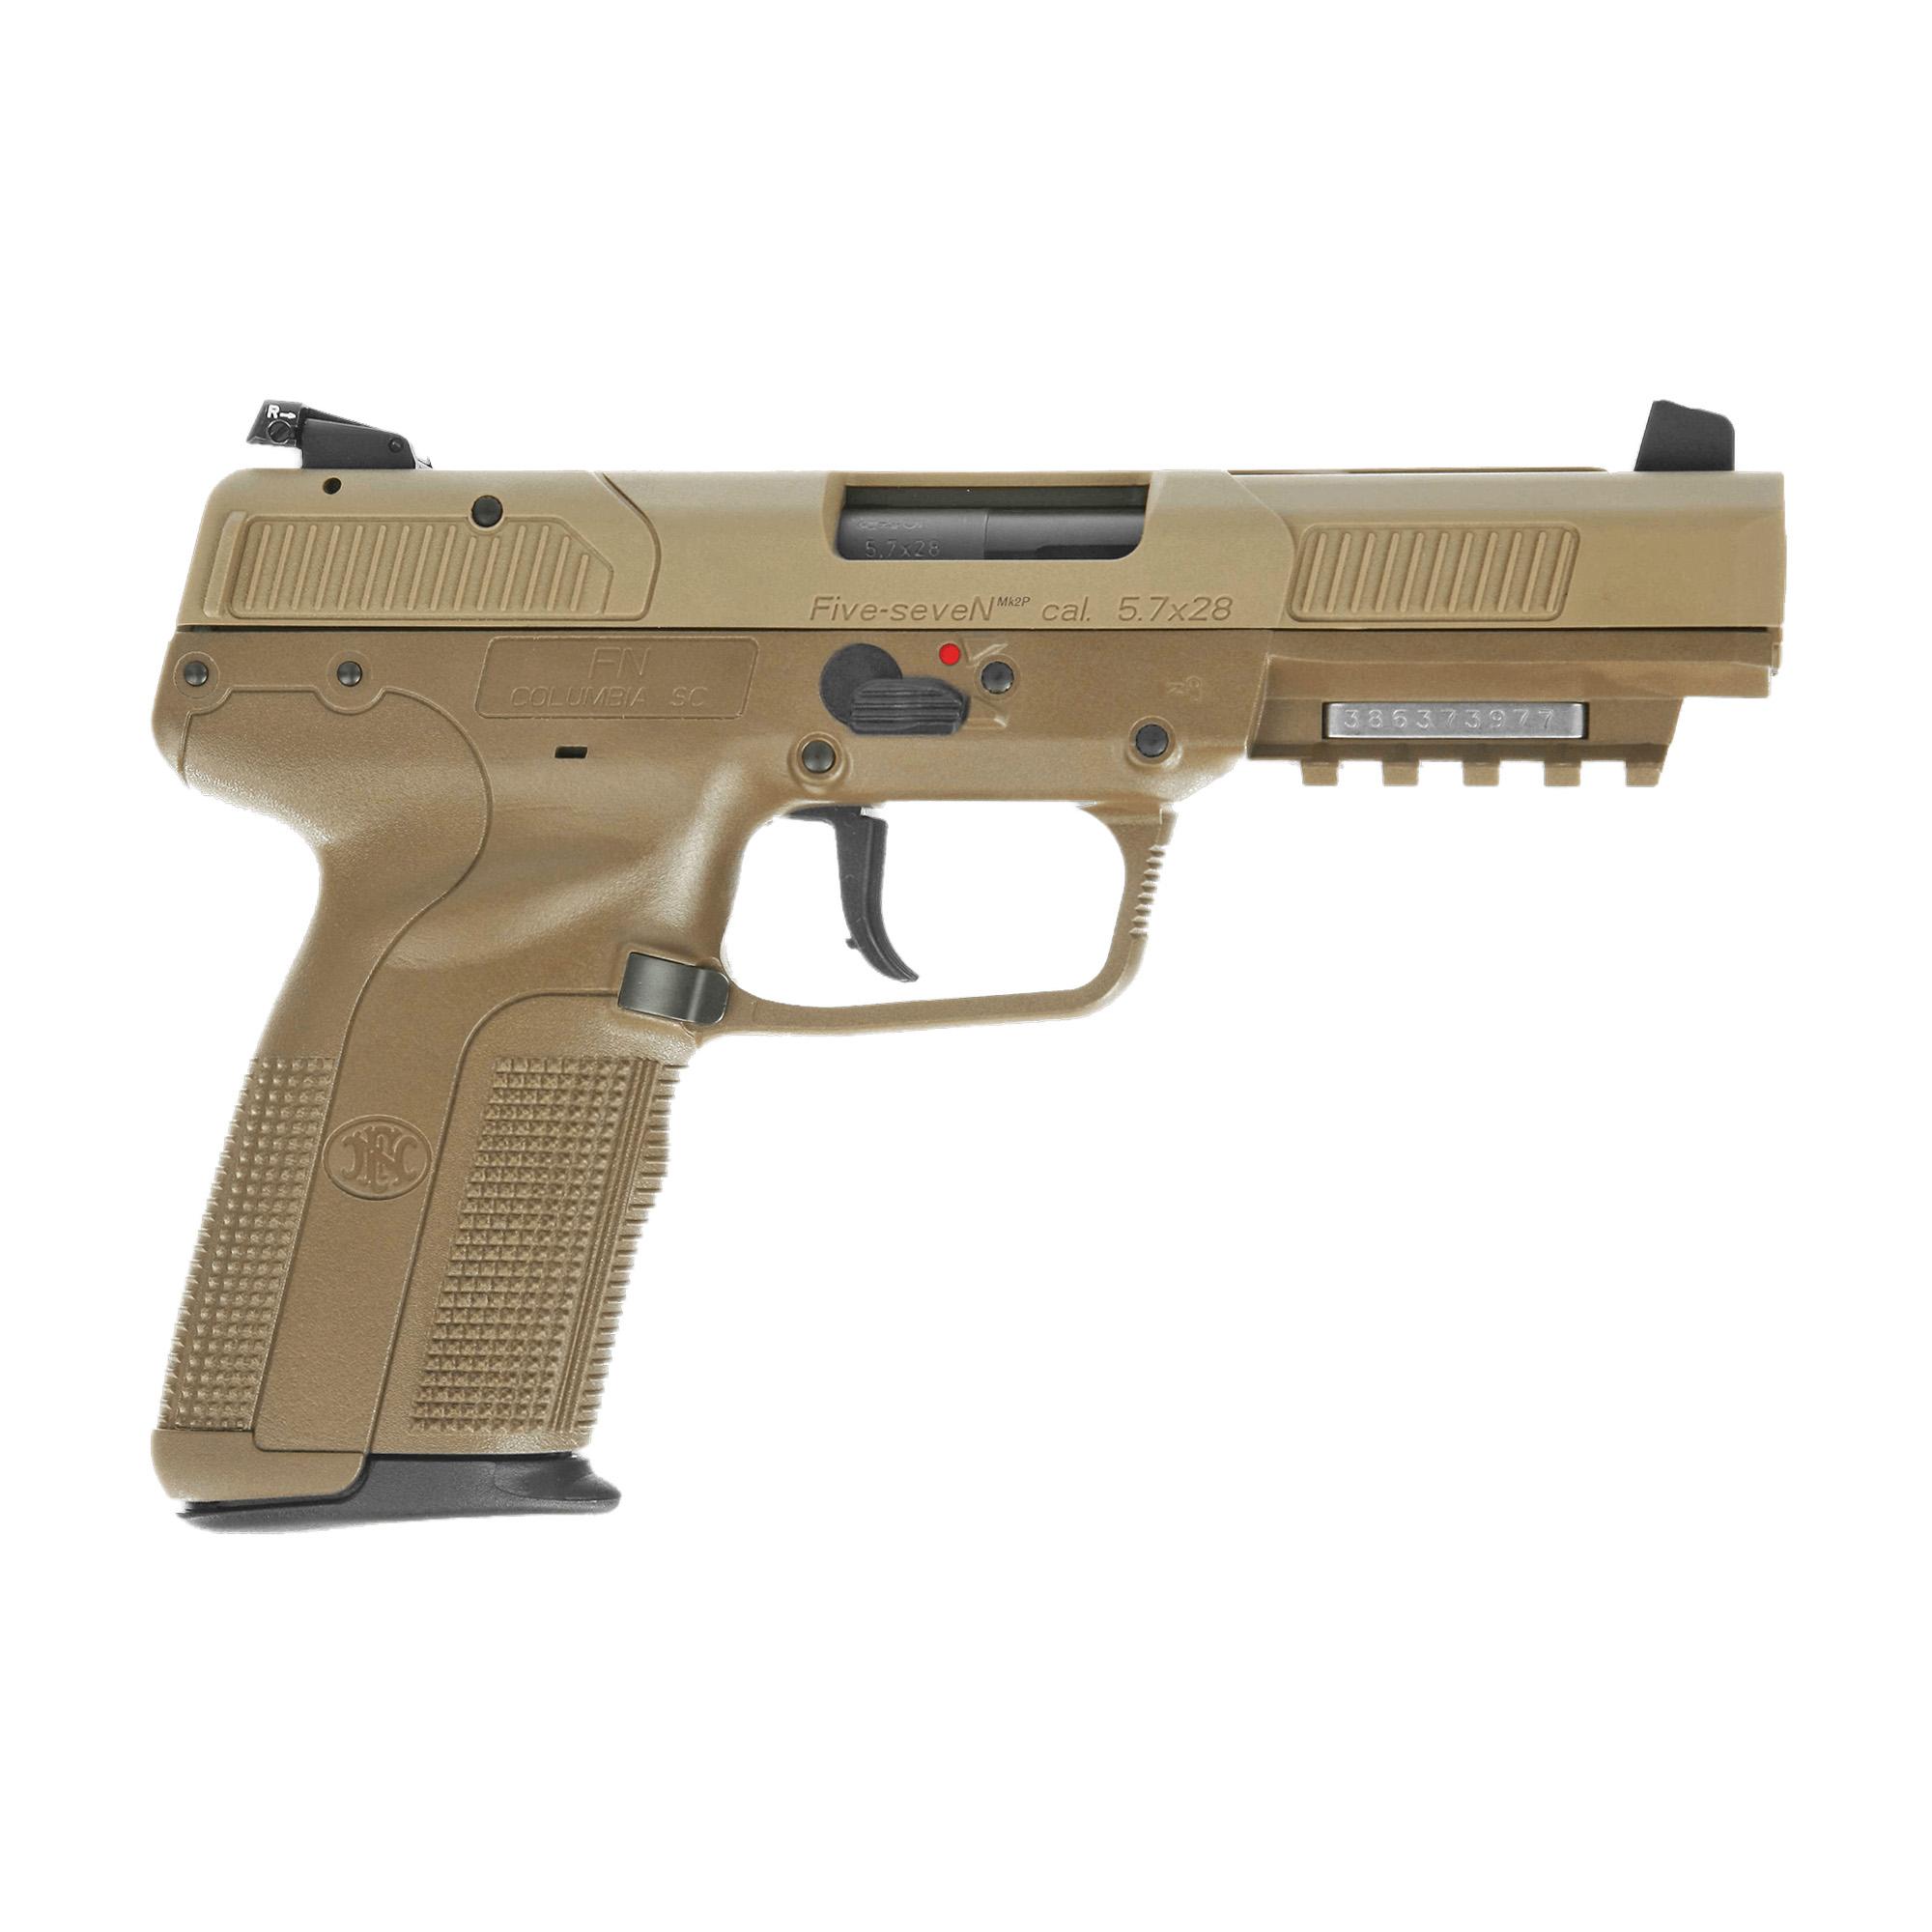 https://cityarsenal.com/product/fn-five-seven-5-7x28mm-pistol-fde-3868900753/